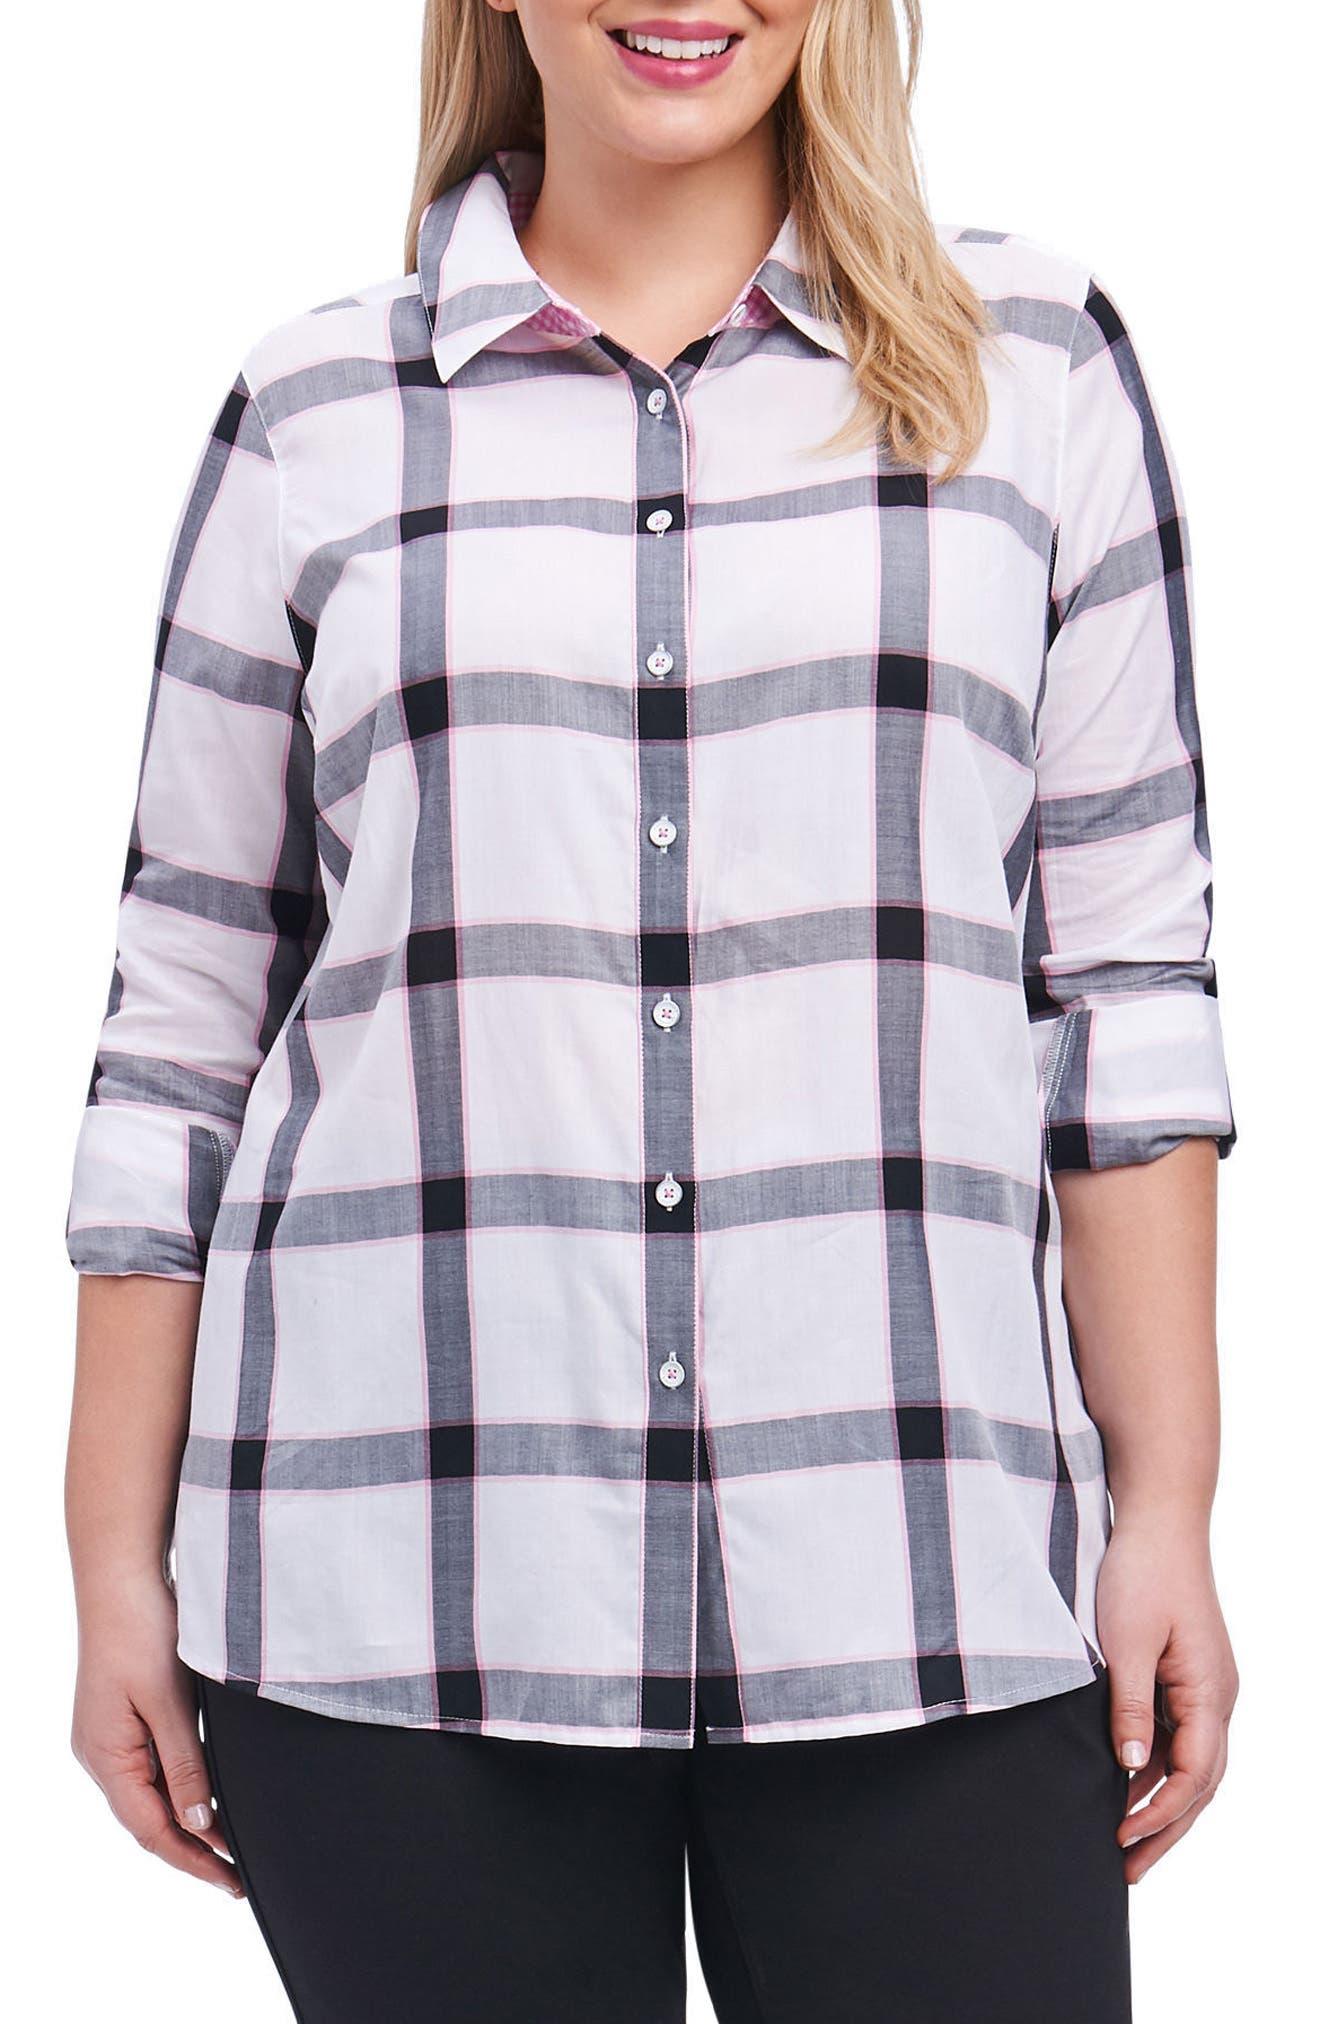 Foxcroft Zoey Herringbone Plaid Shirt (Plus Size)